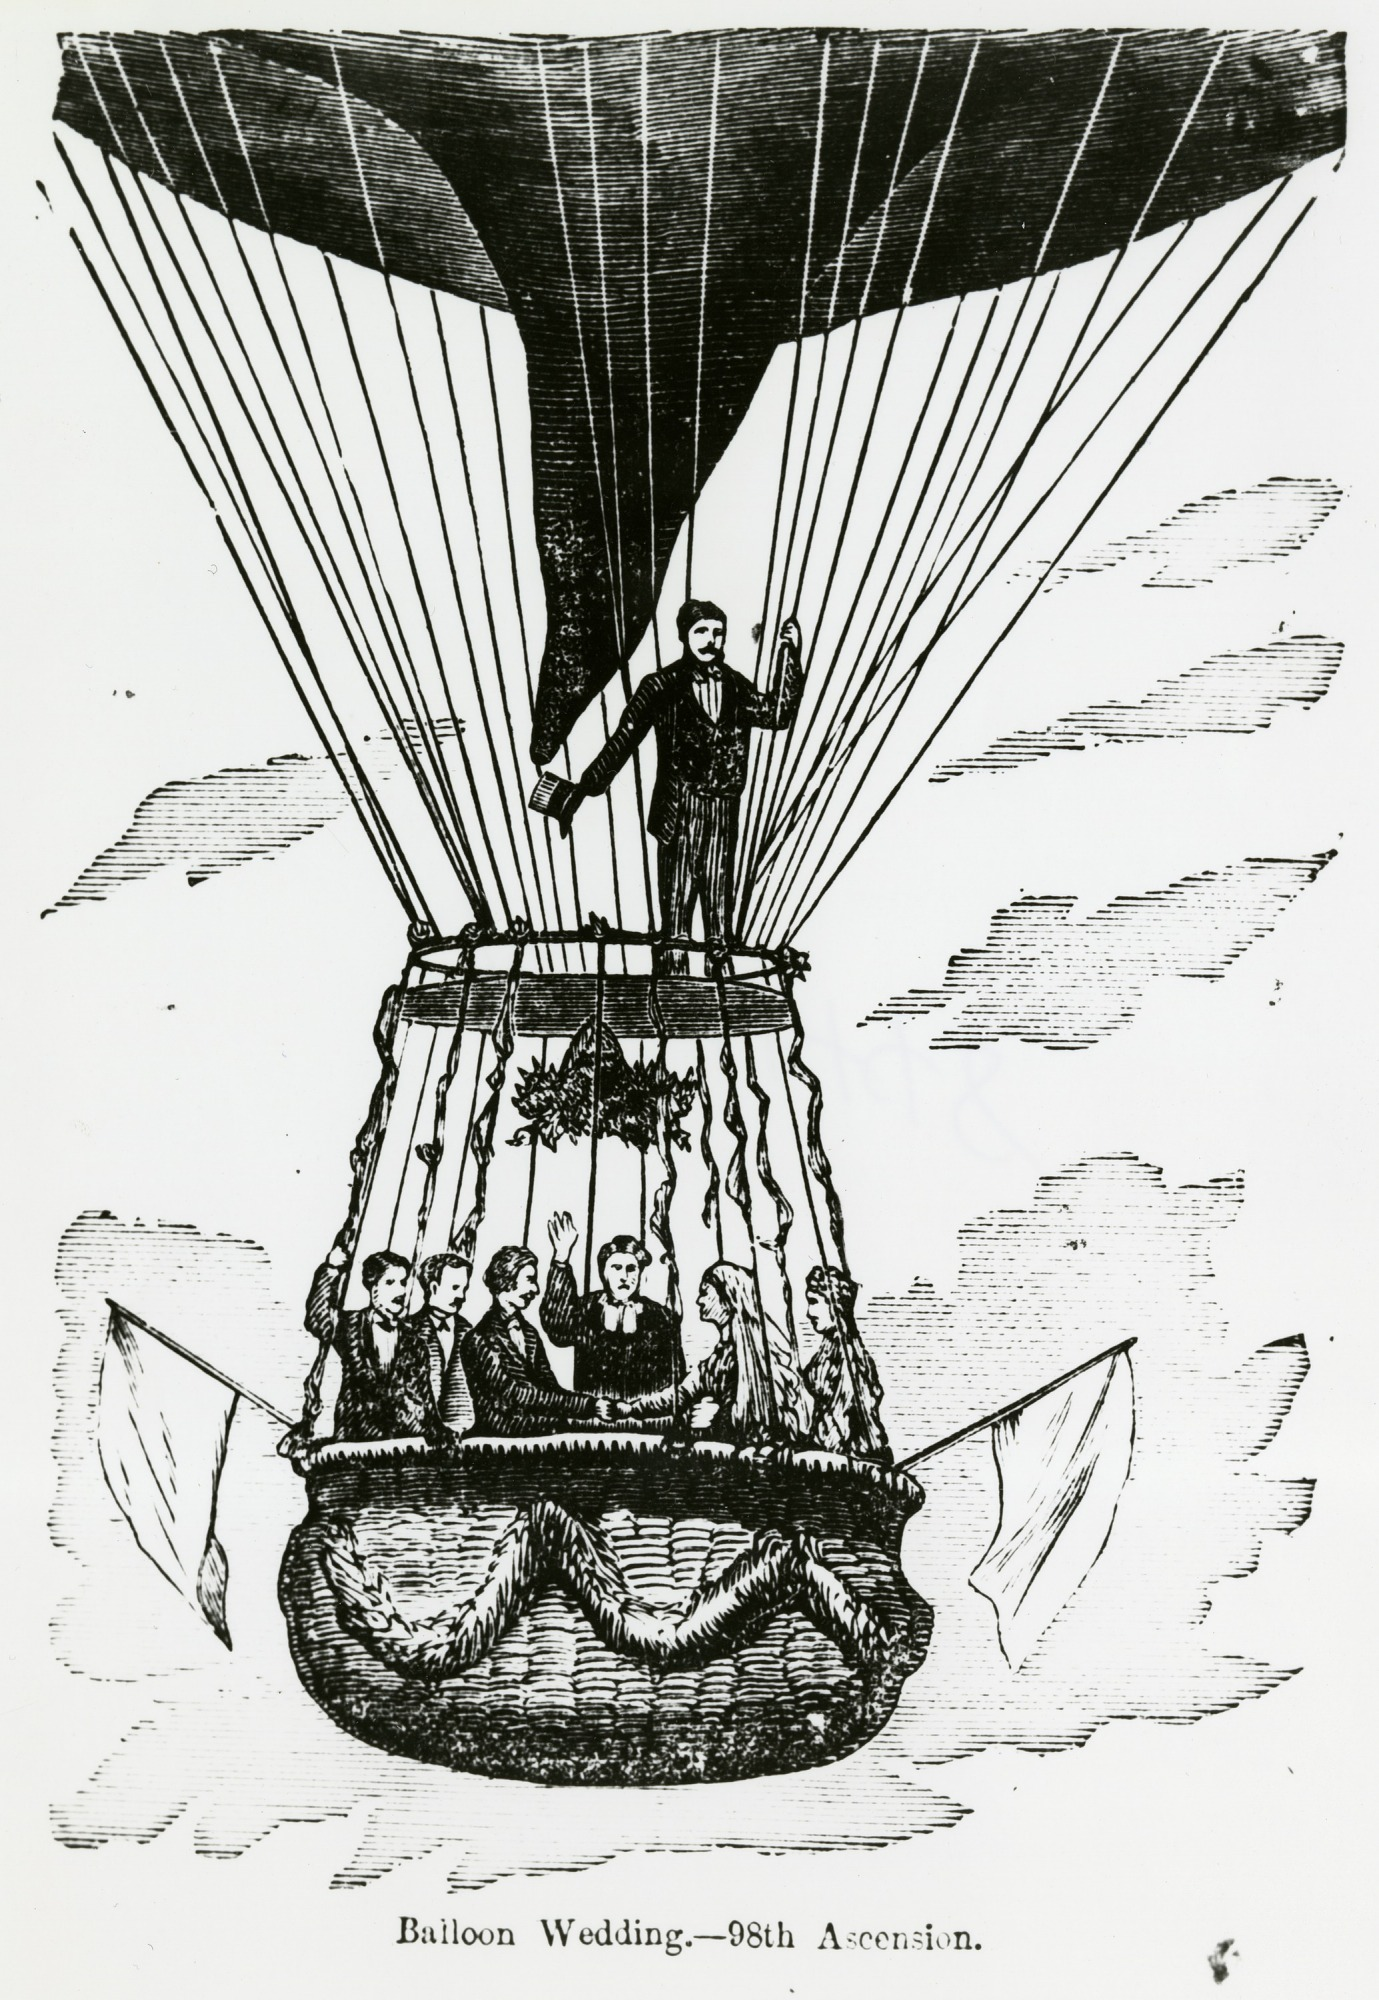 images for LTA, Balloons; USA, Donaldson (Washington H.), 98th Ascension, Balloon Wedding (1874). photograph